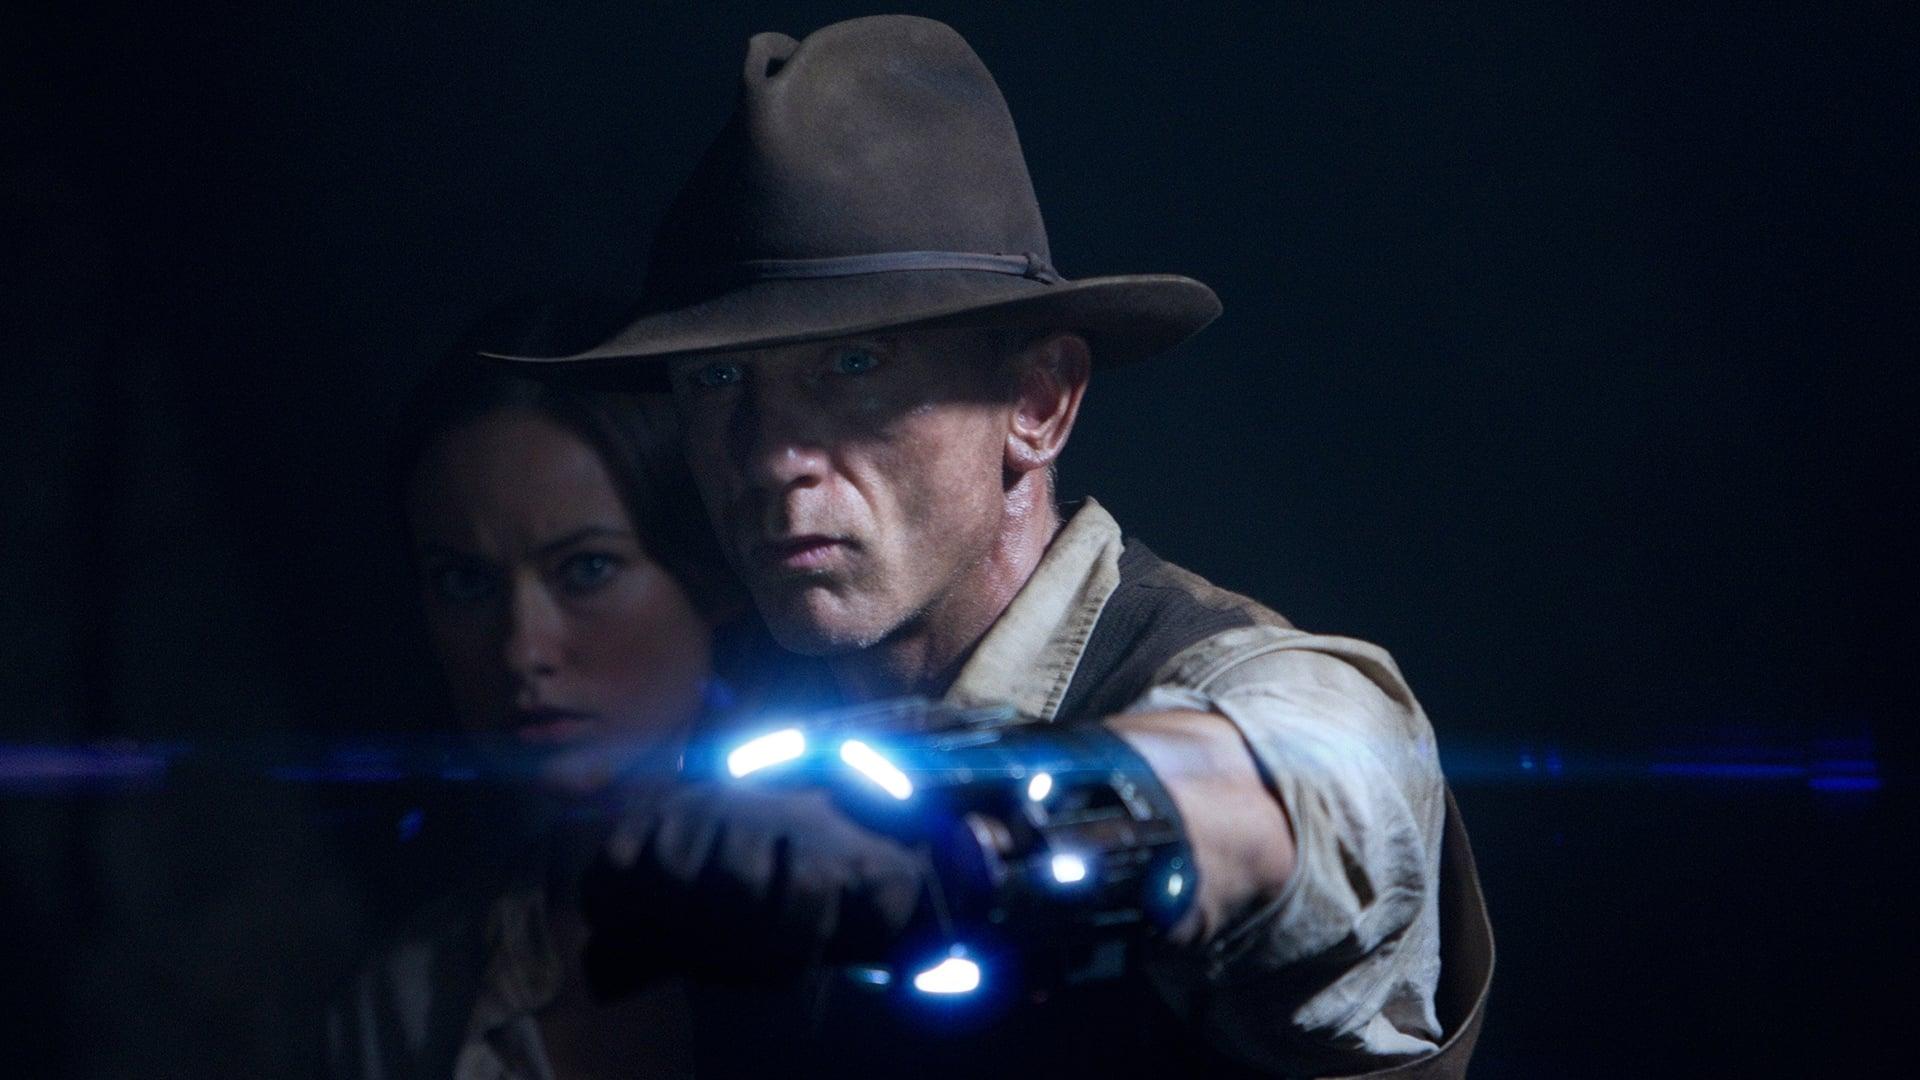 Watch Full Cowboys & Aliens 2011 Movie